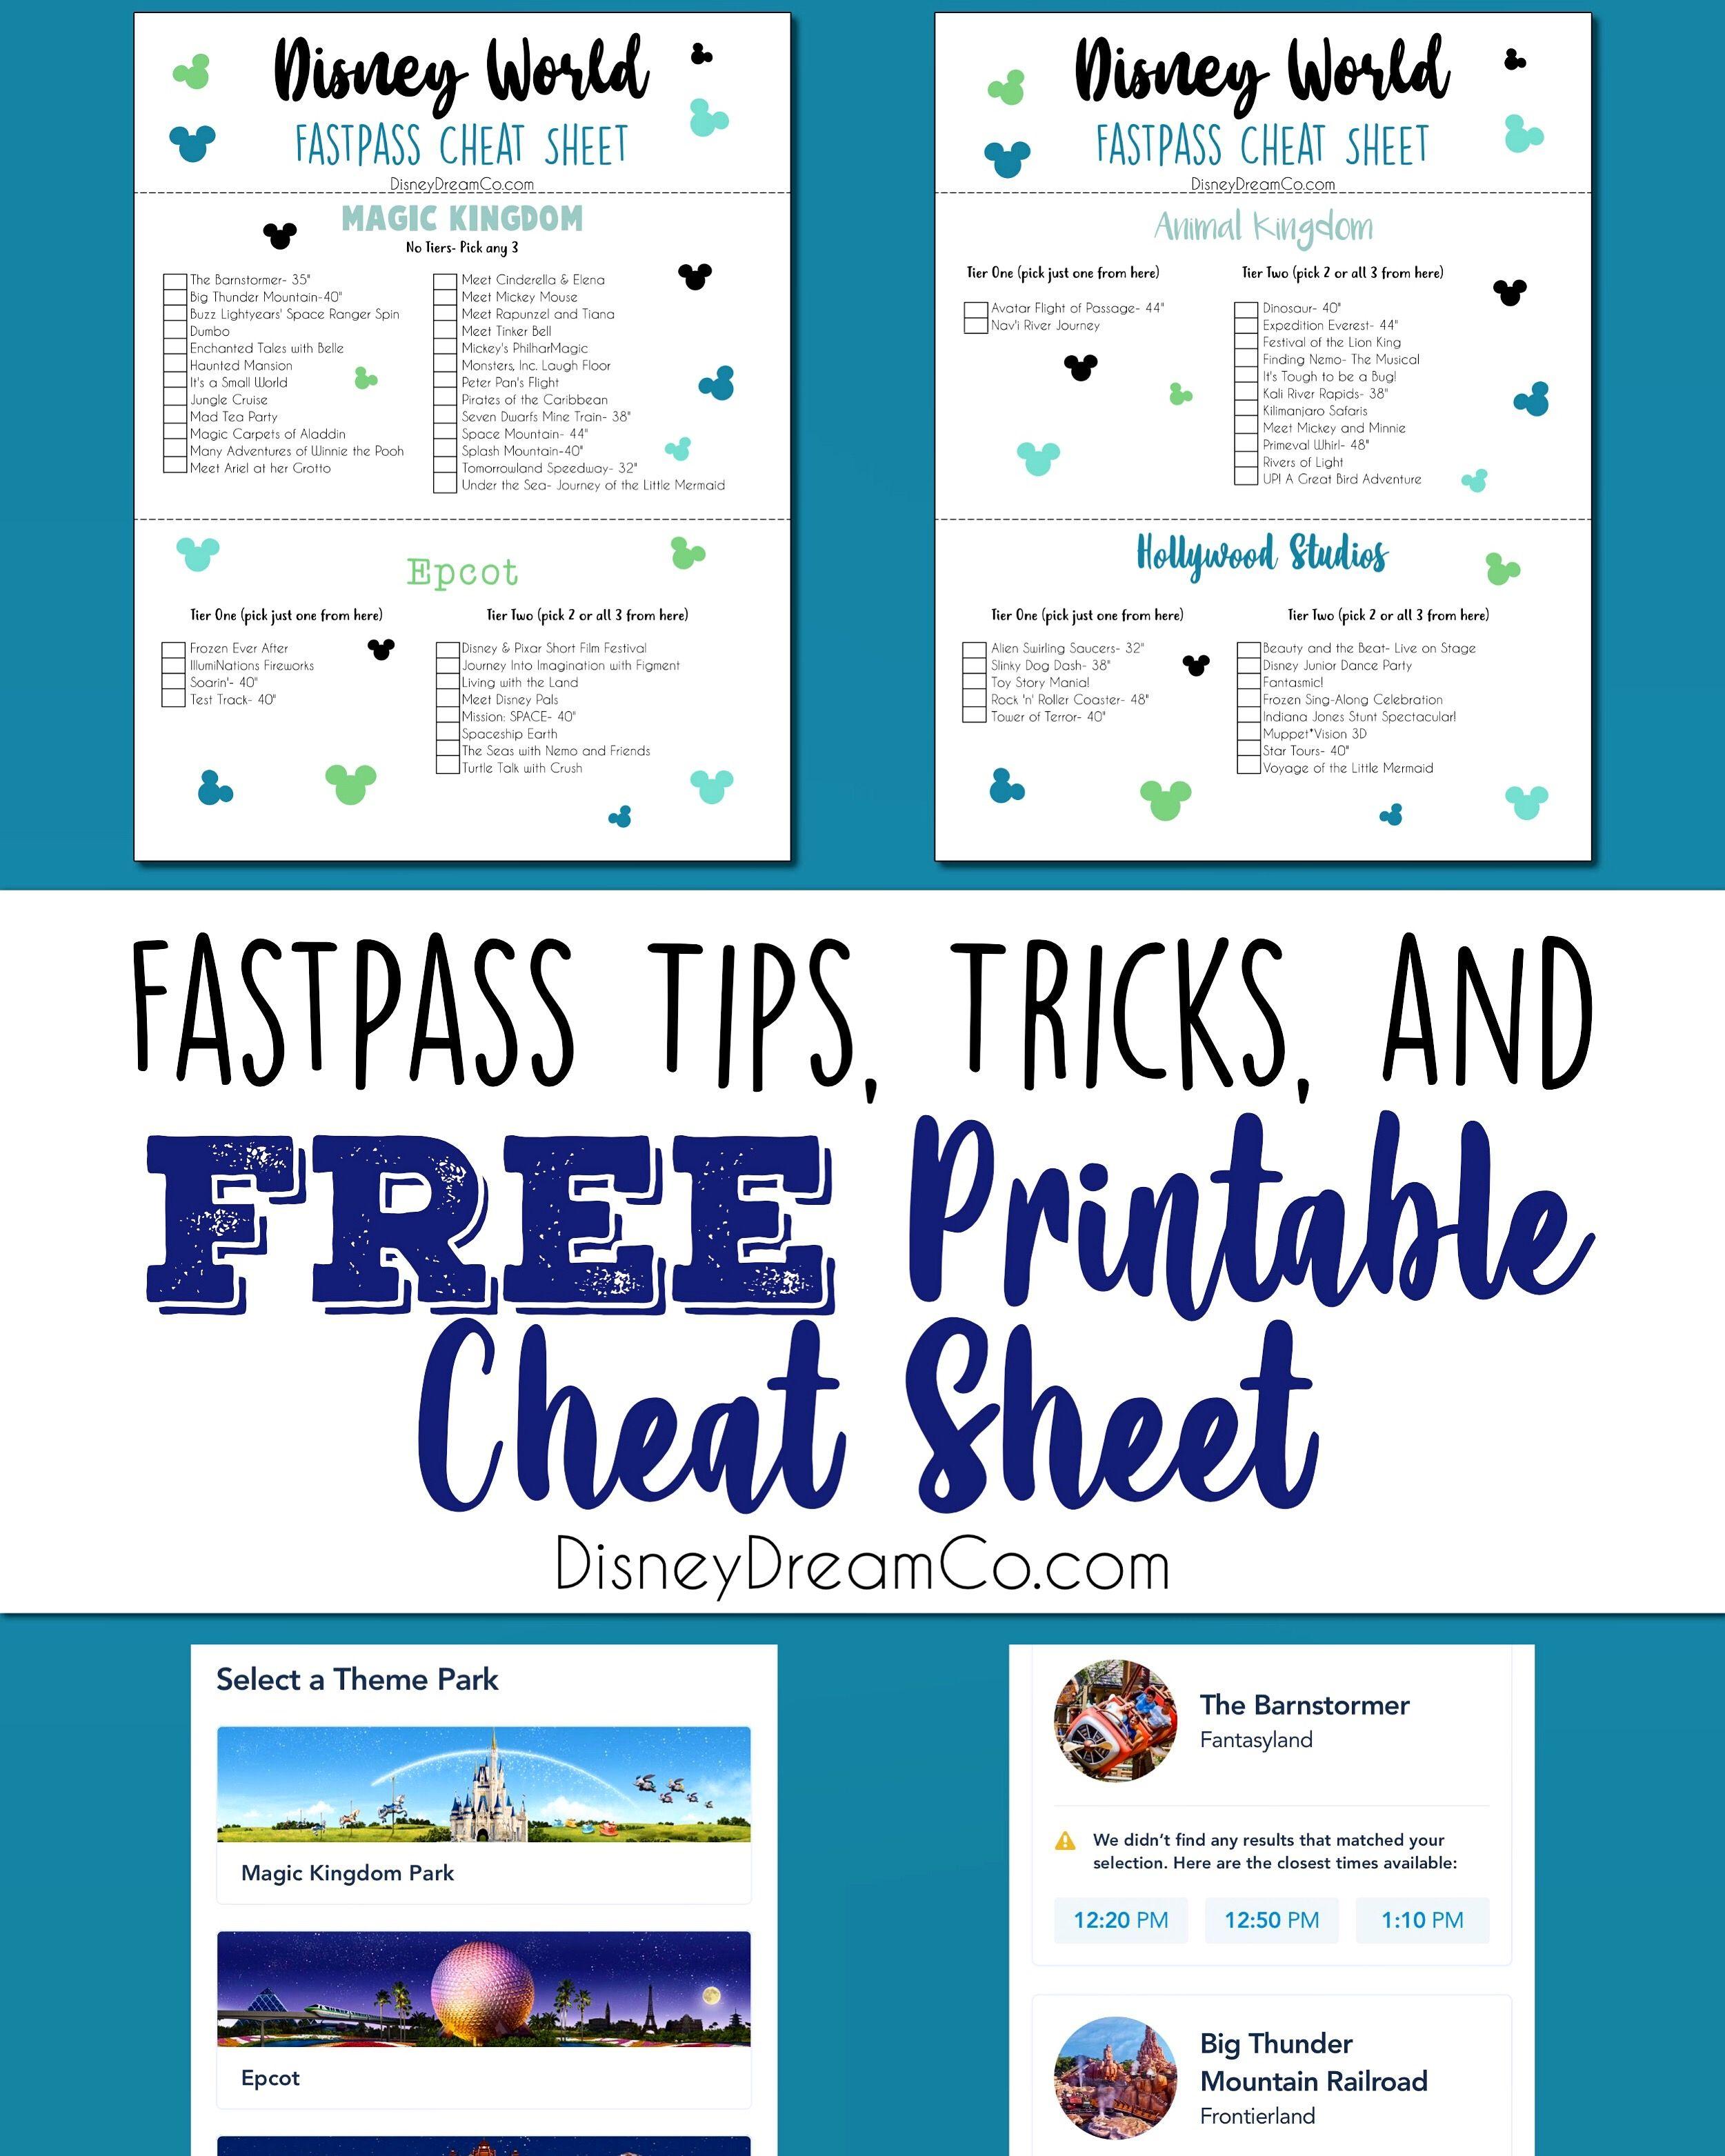 Disney World Fastpass Tips and Cheat Sheet!